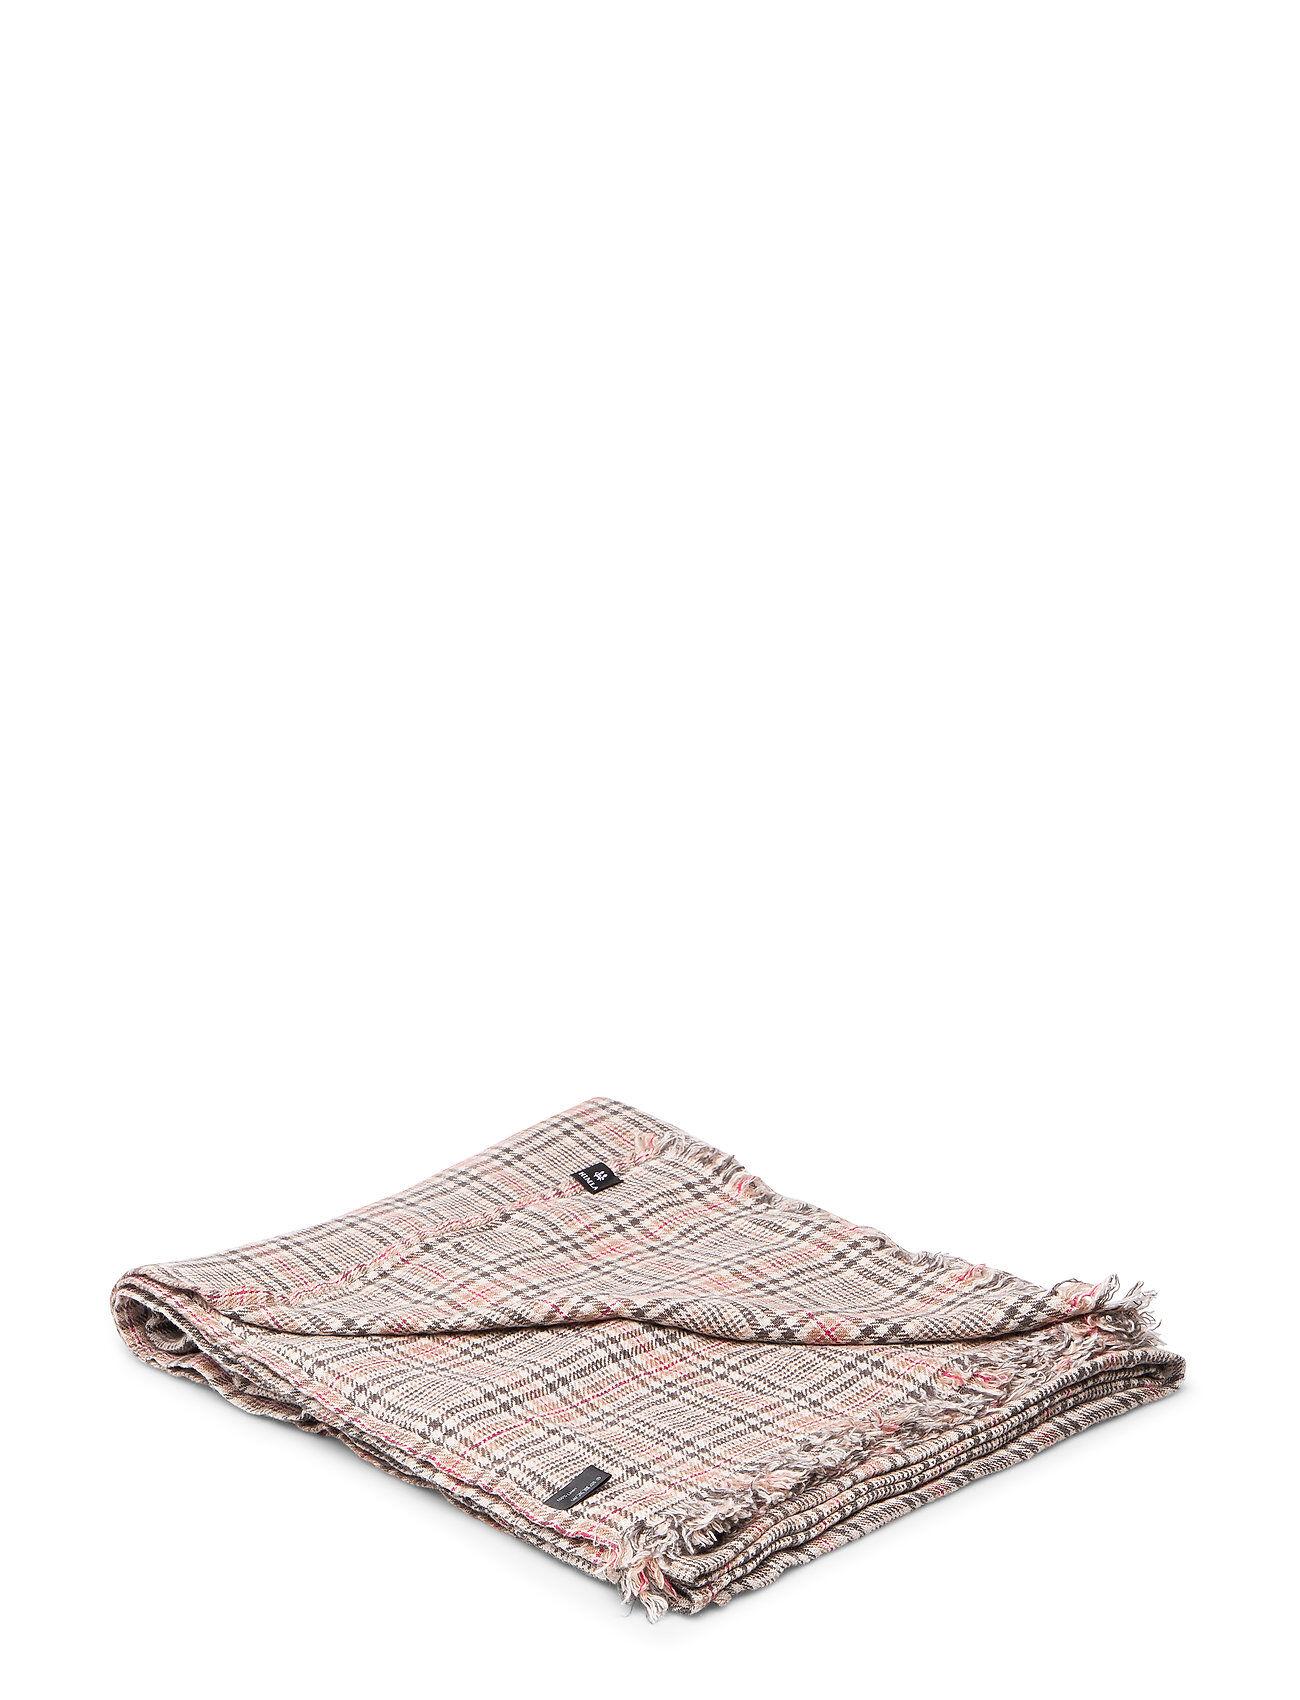 Himla Urban Soul Pillowcase Home Bedroom Bedding Pillowcases Vaaleanpunainen Himla